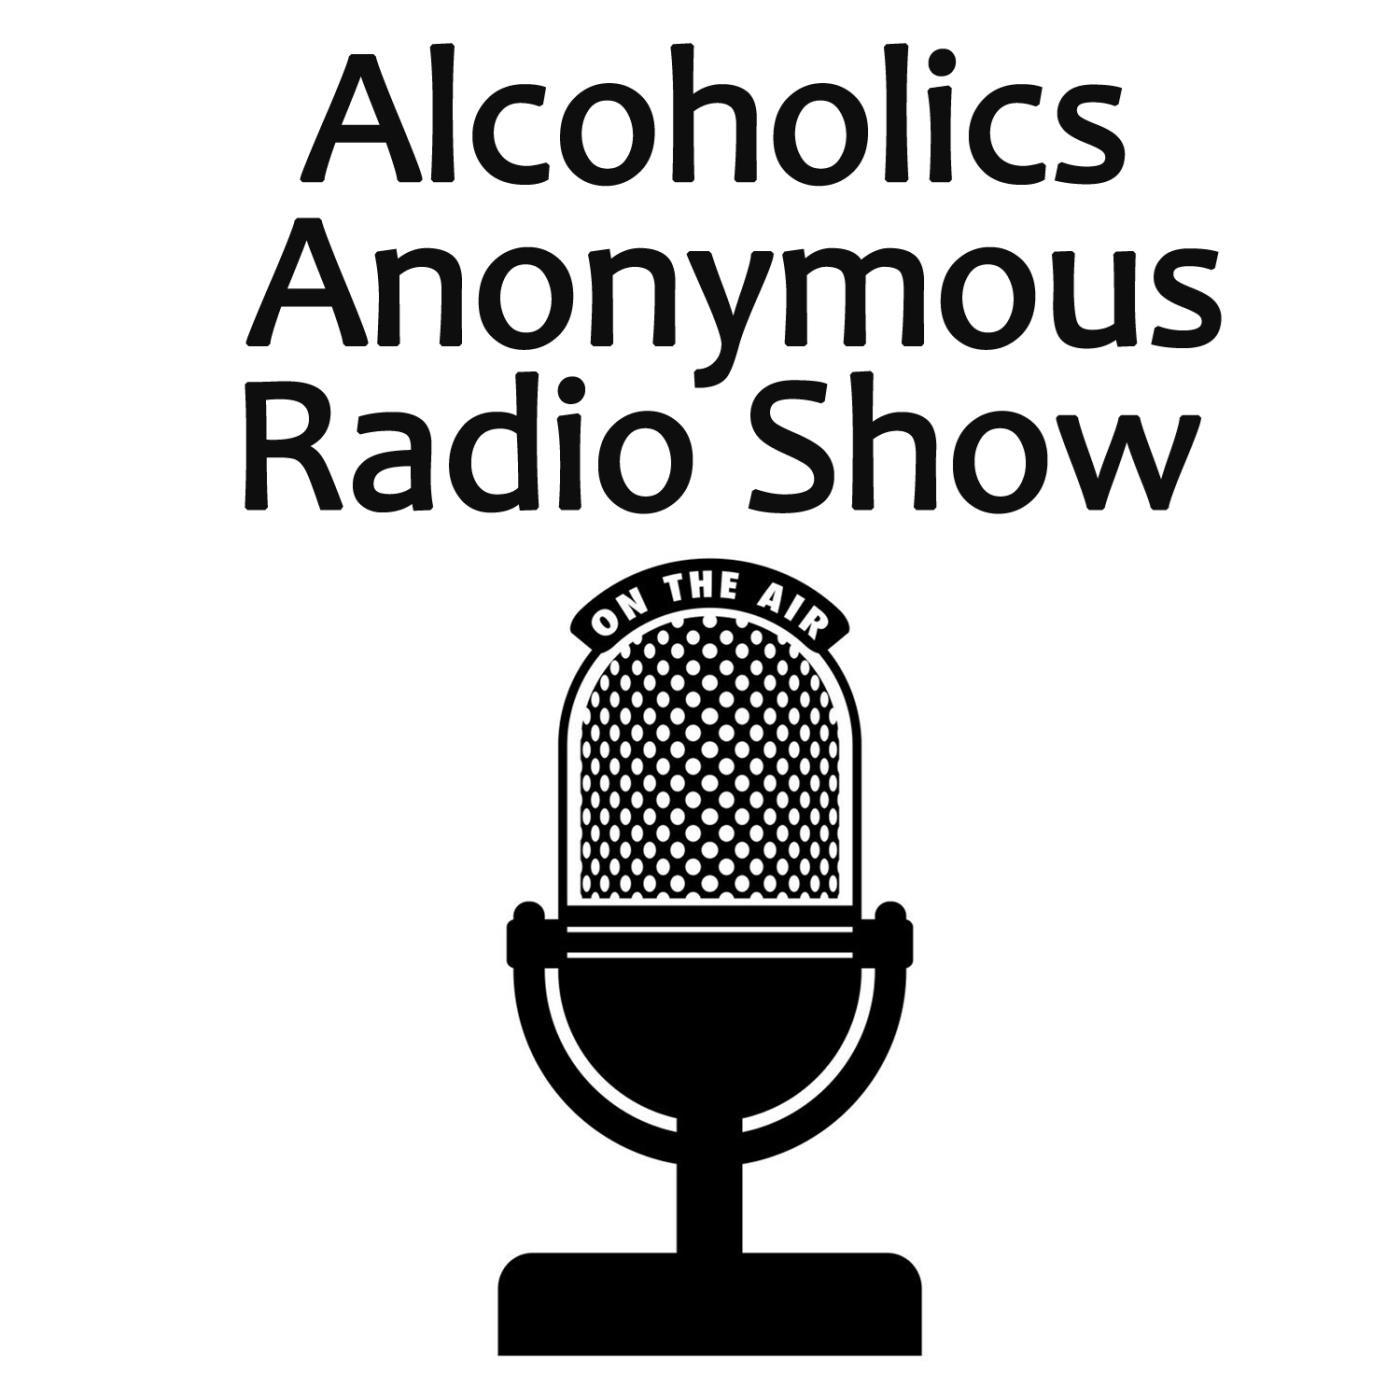 Alcoholics Anonymous Radio Show - Jeromy 33 years sober